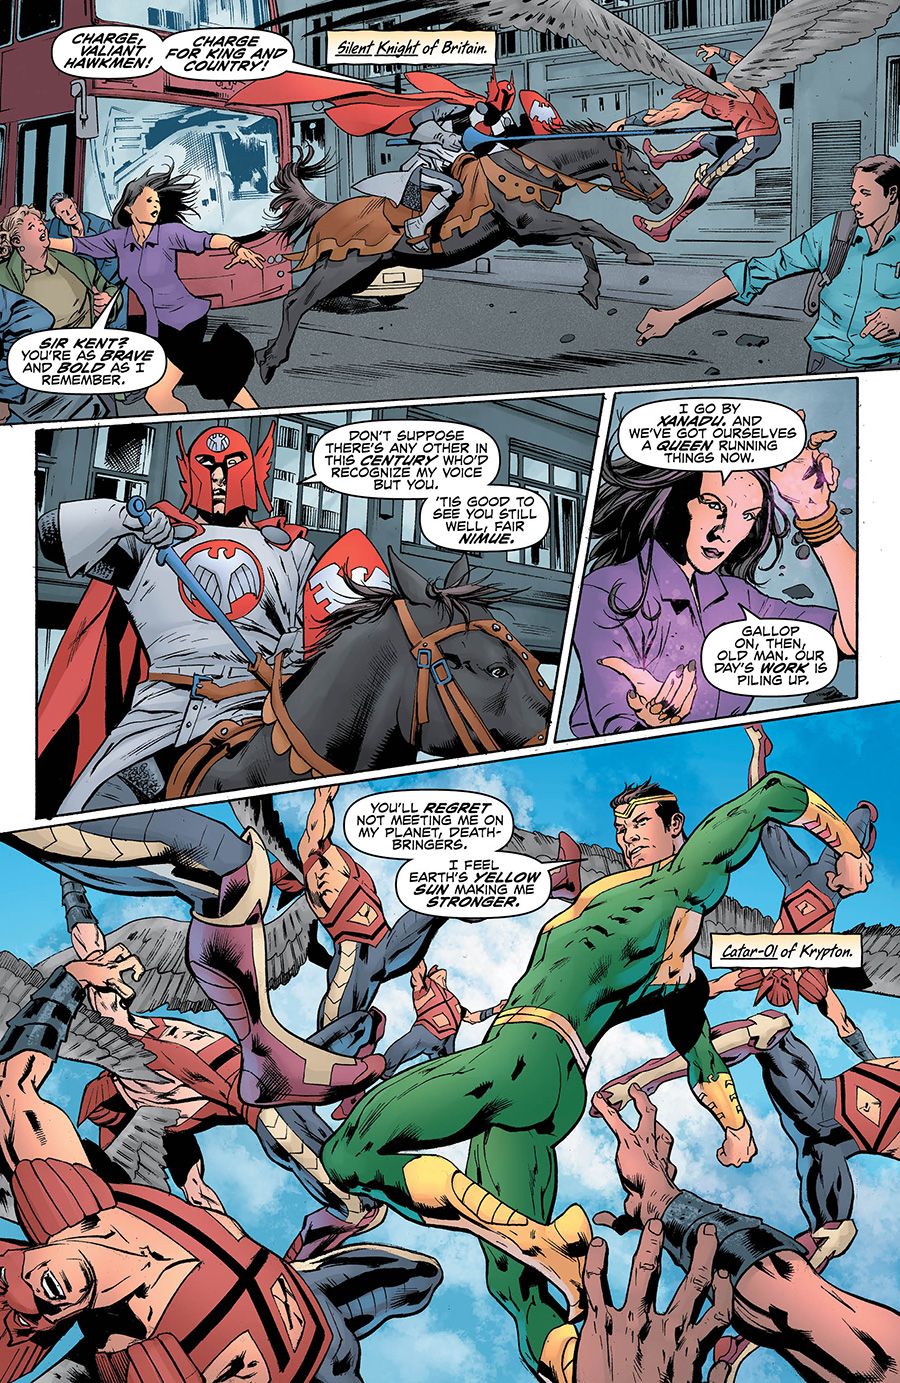 HAWKMAN 11_4 - DC Comics News